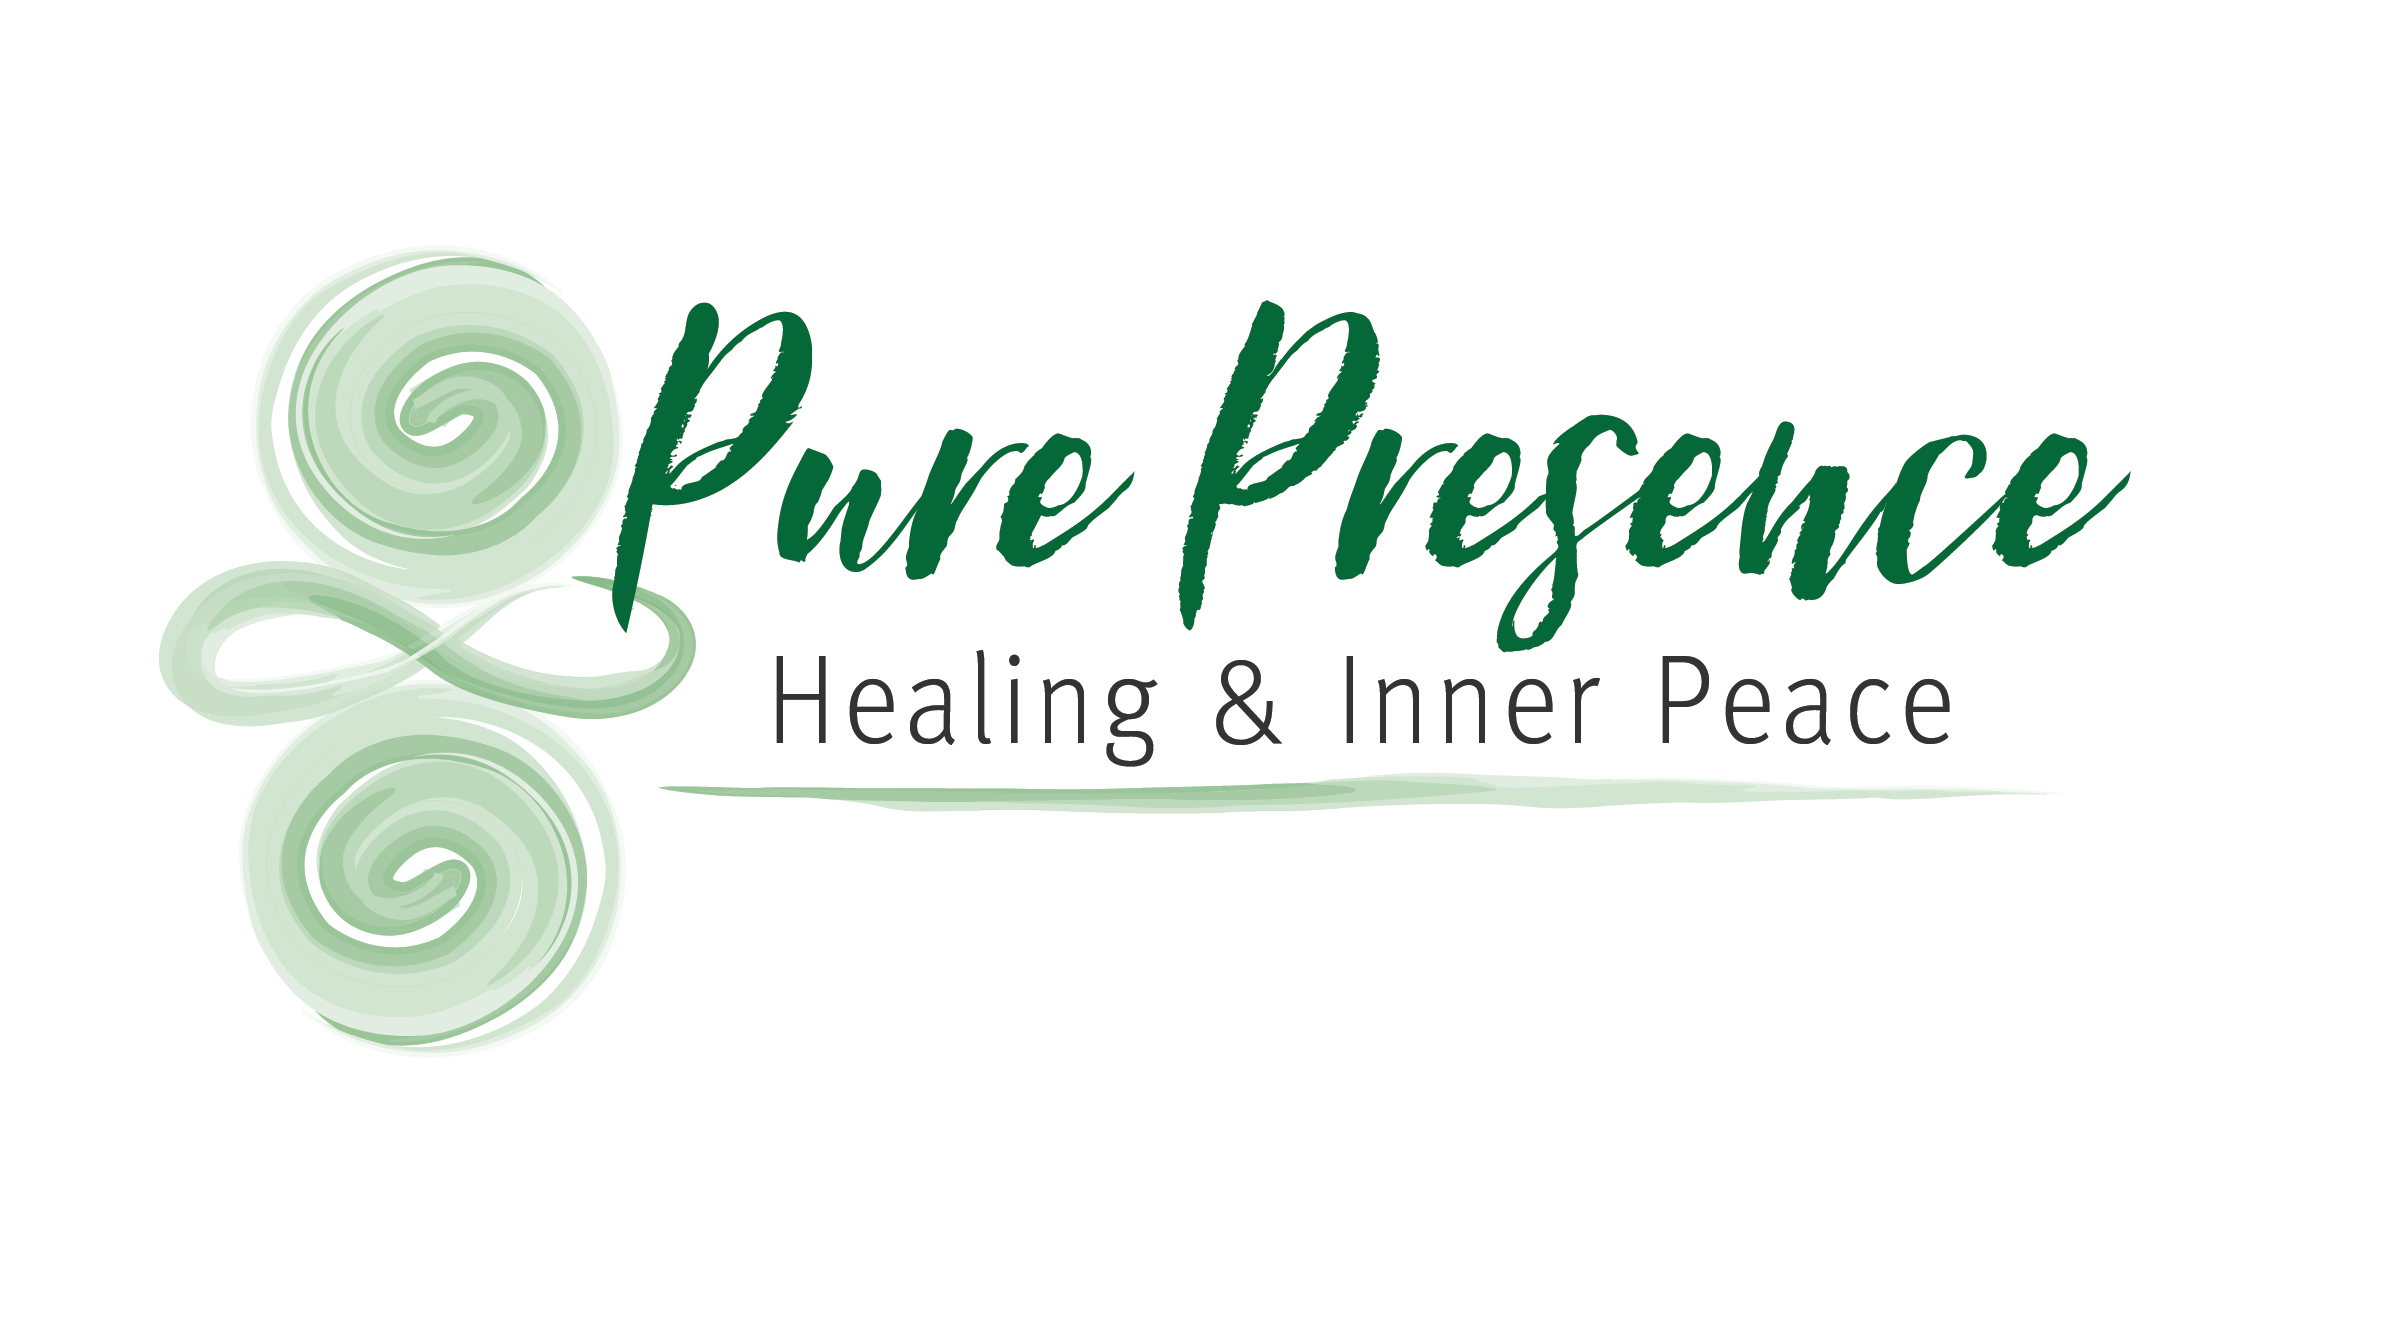 Pure Presence